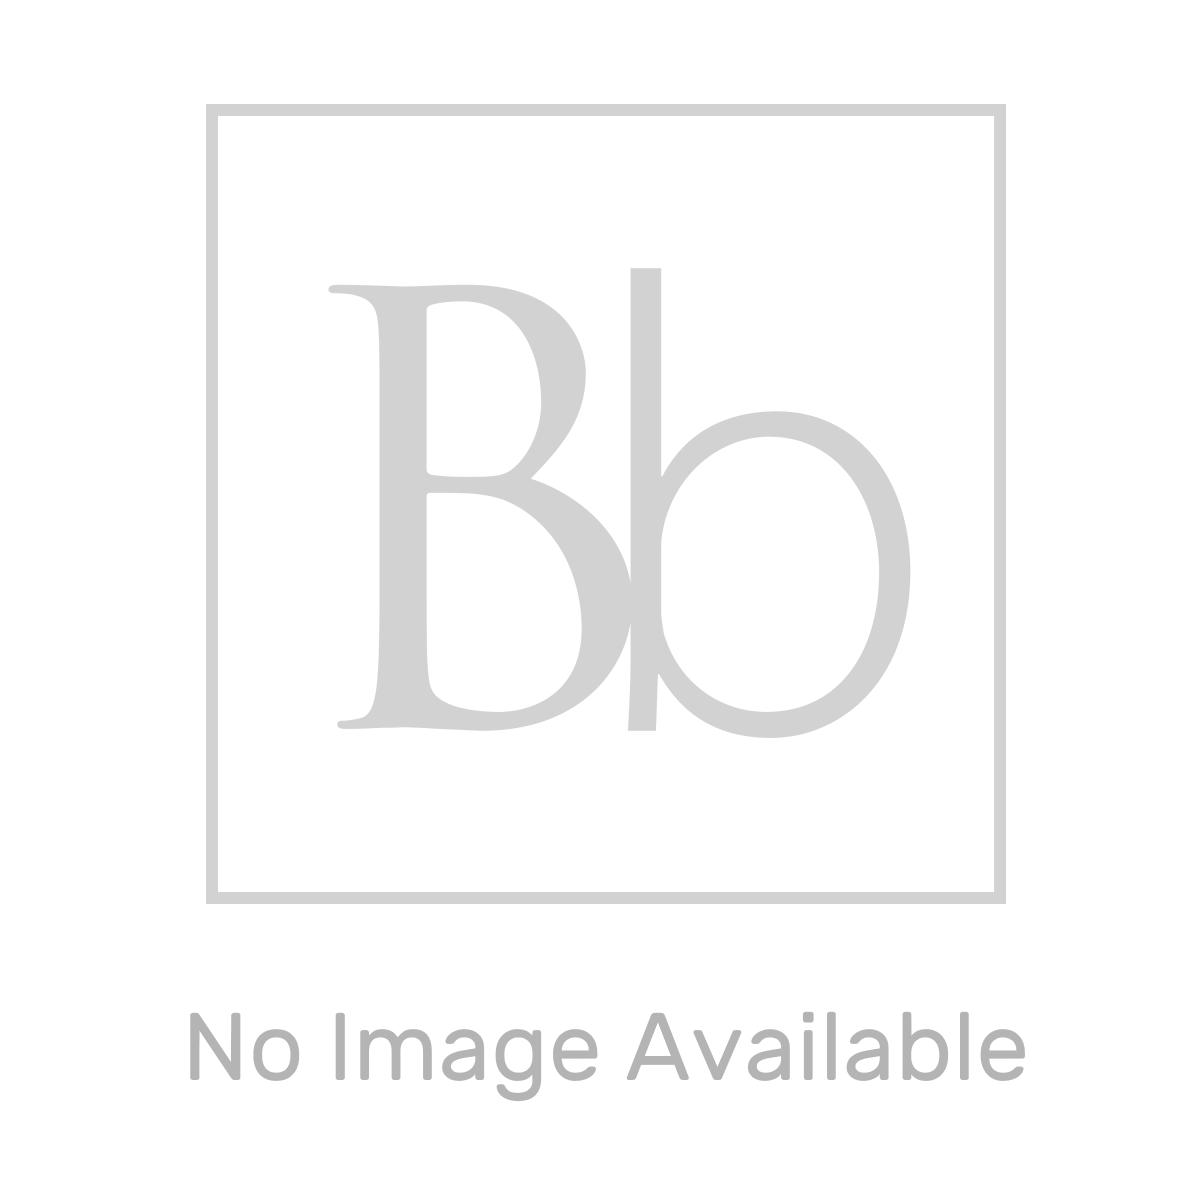 RAK Washington 1 Tap Hole Basin with Full Pedestal 650mm Drawing